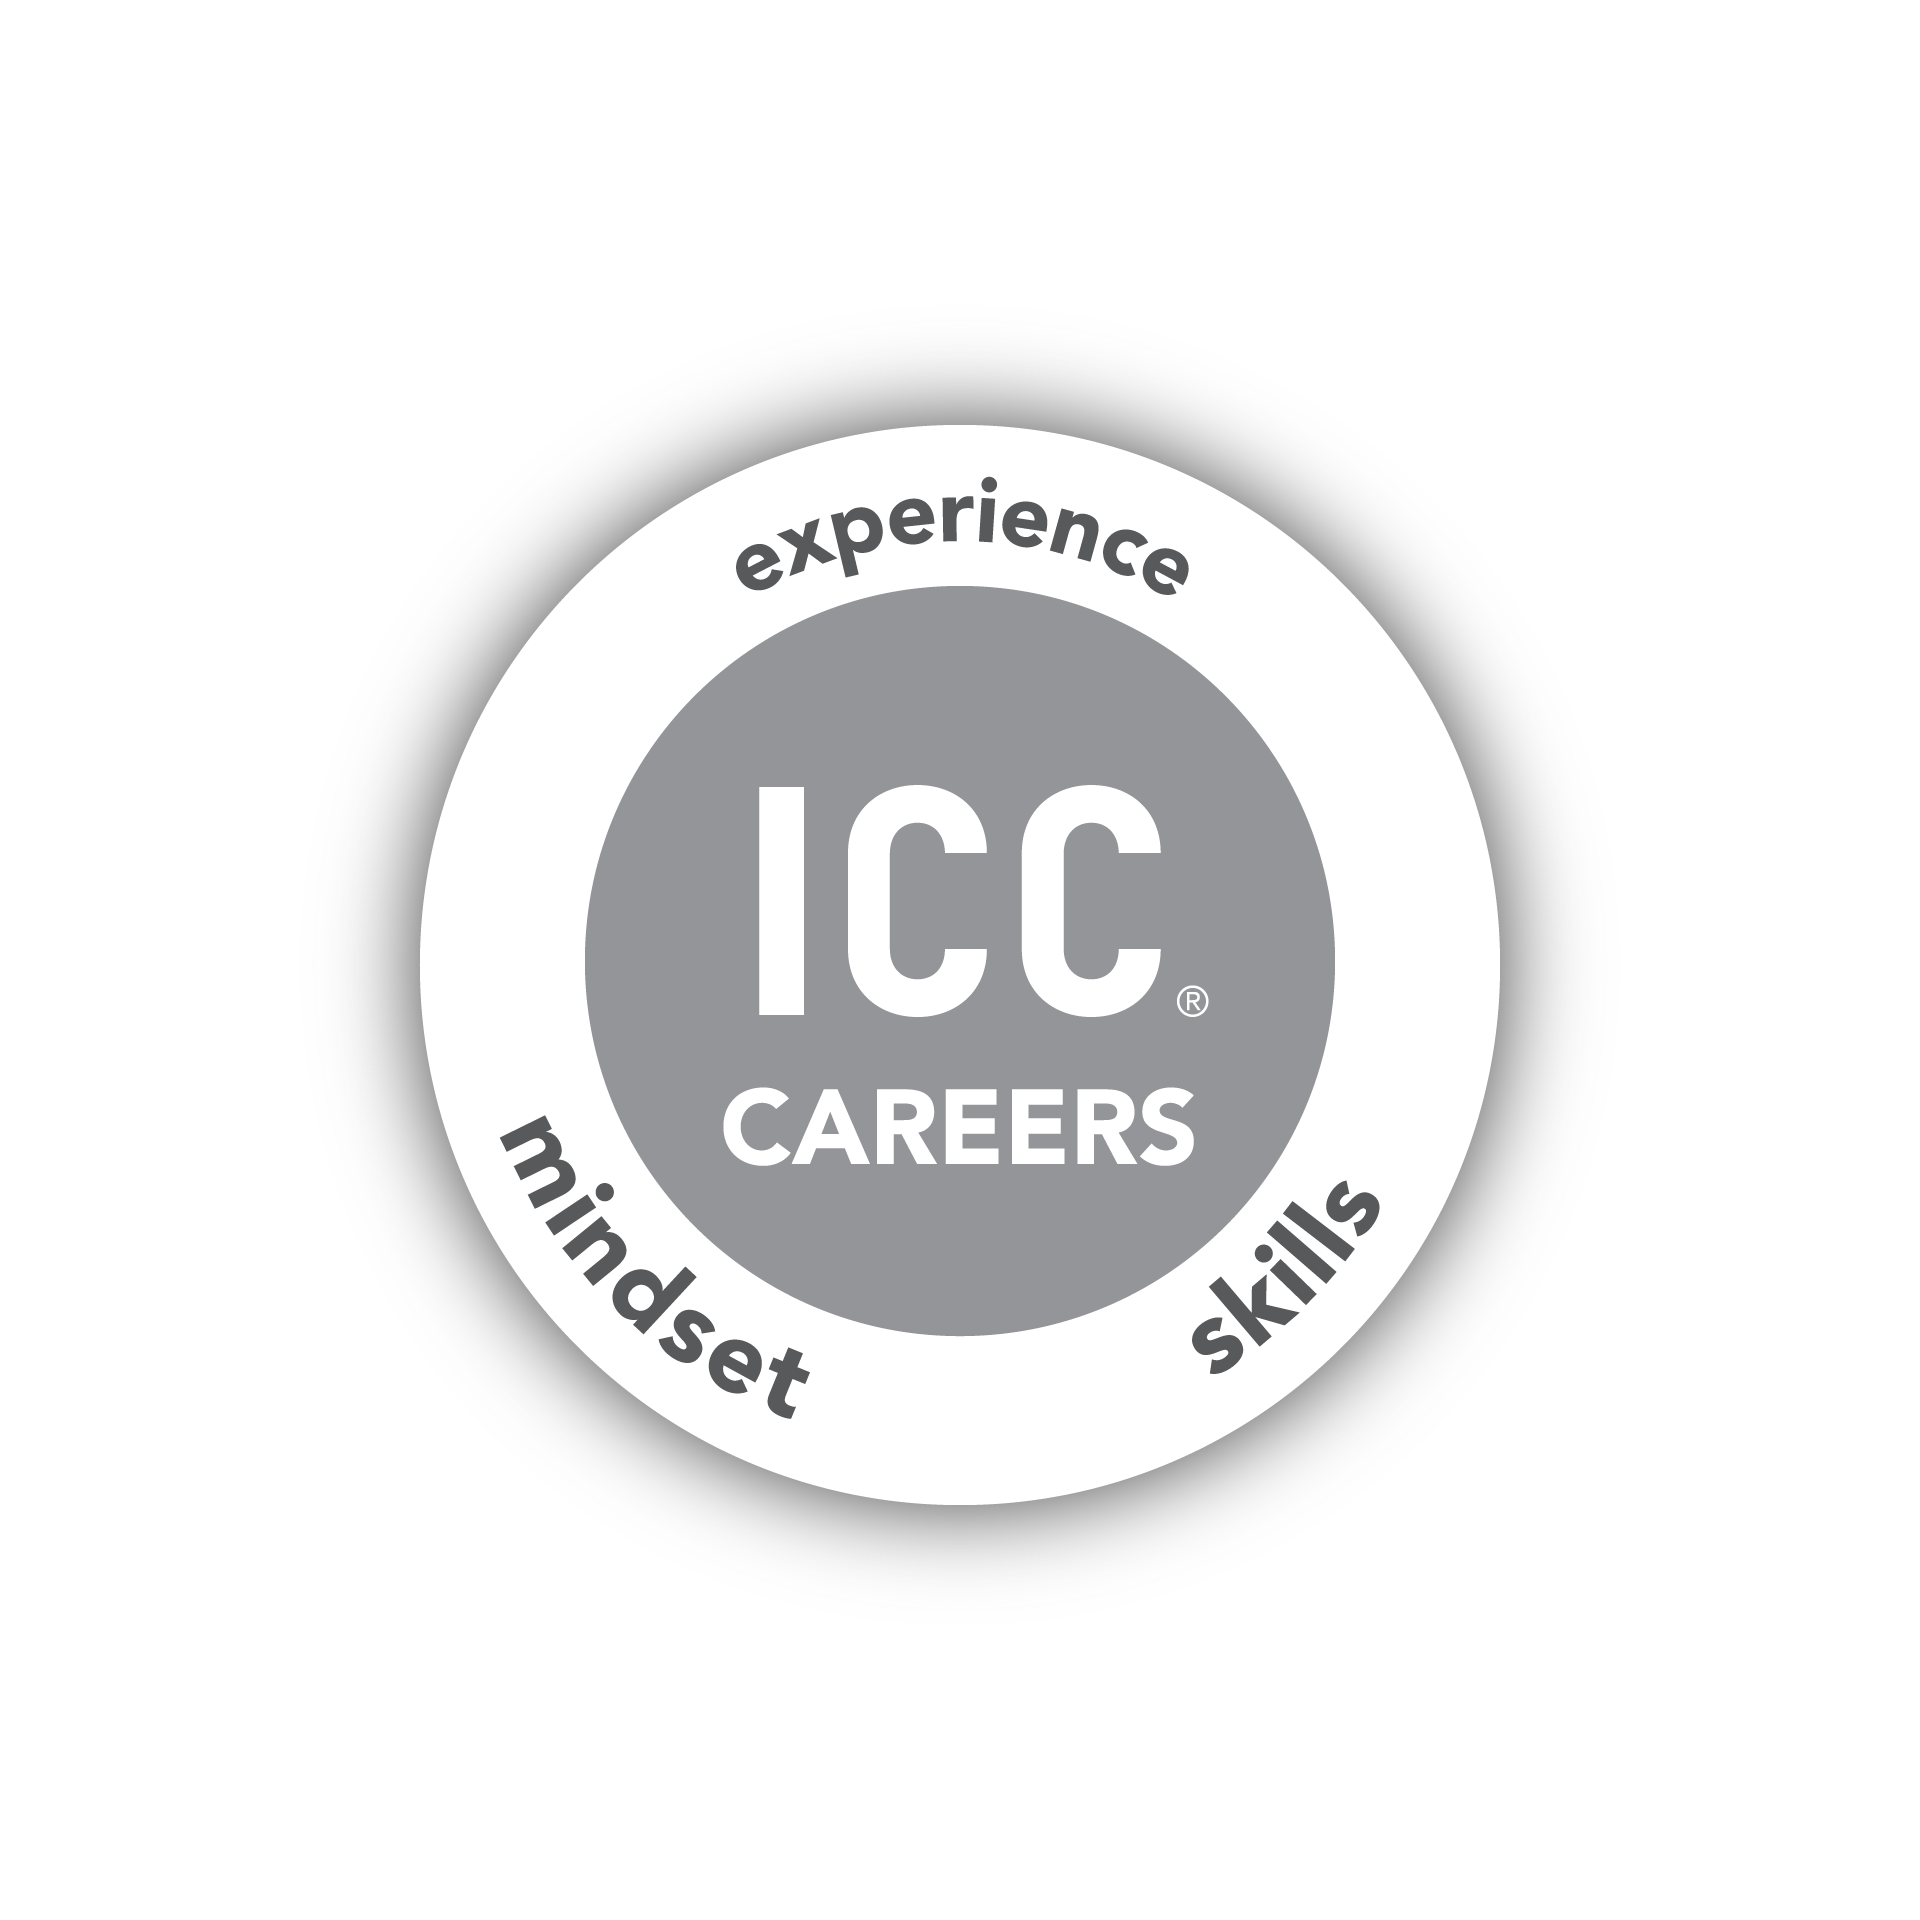 Experience, Skills, Education